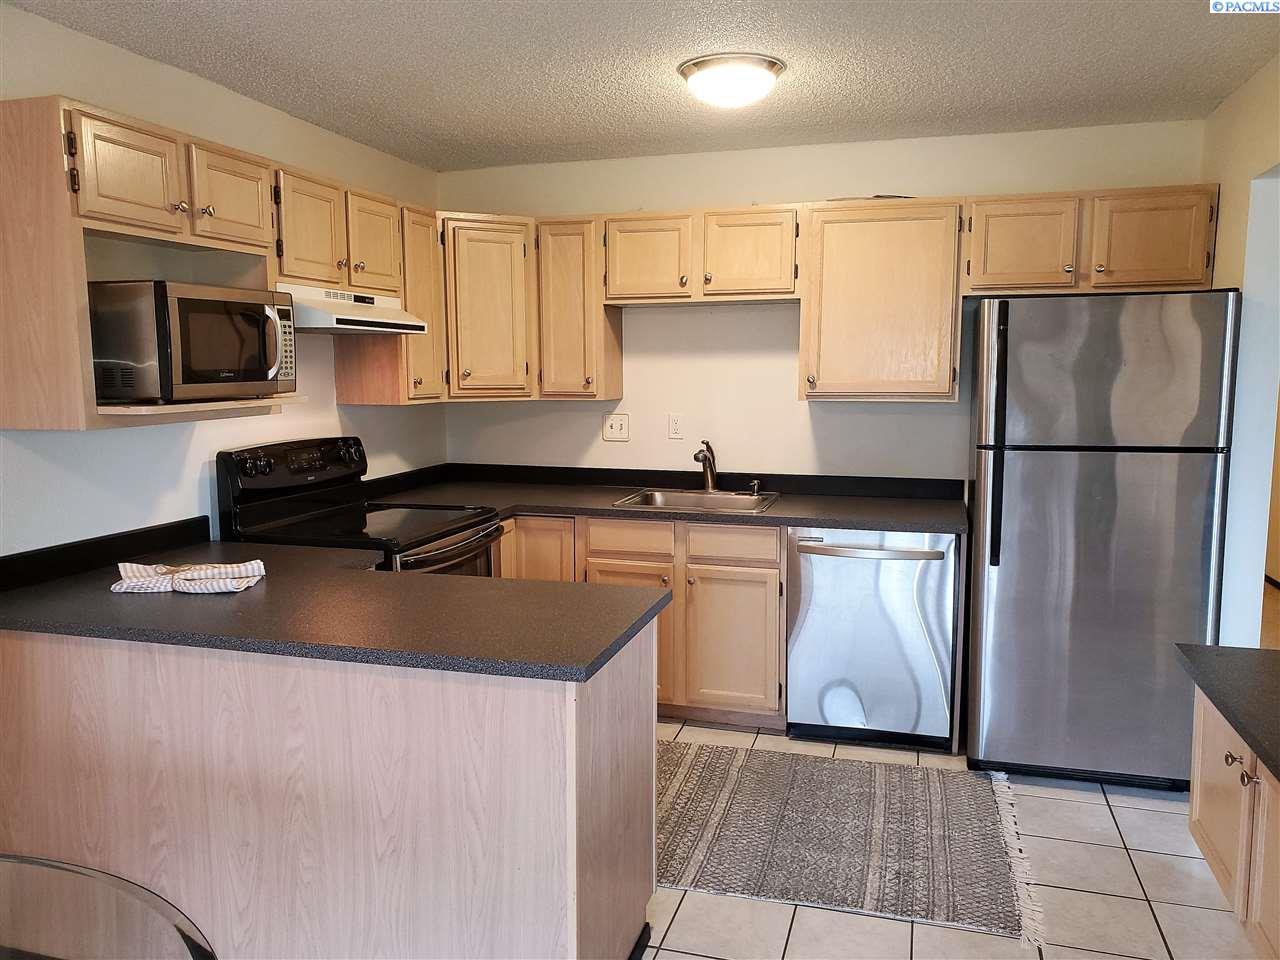 Condominiums for Sale at 303 Gage #301 Richland, Washington 99352 United States